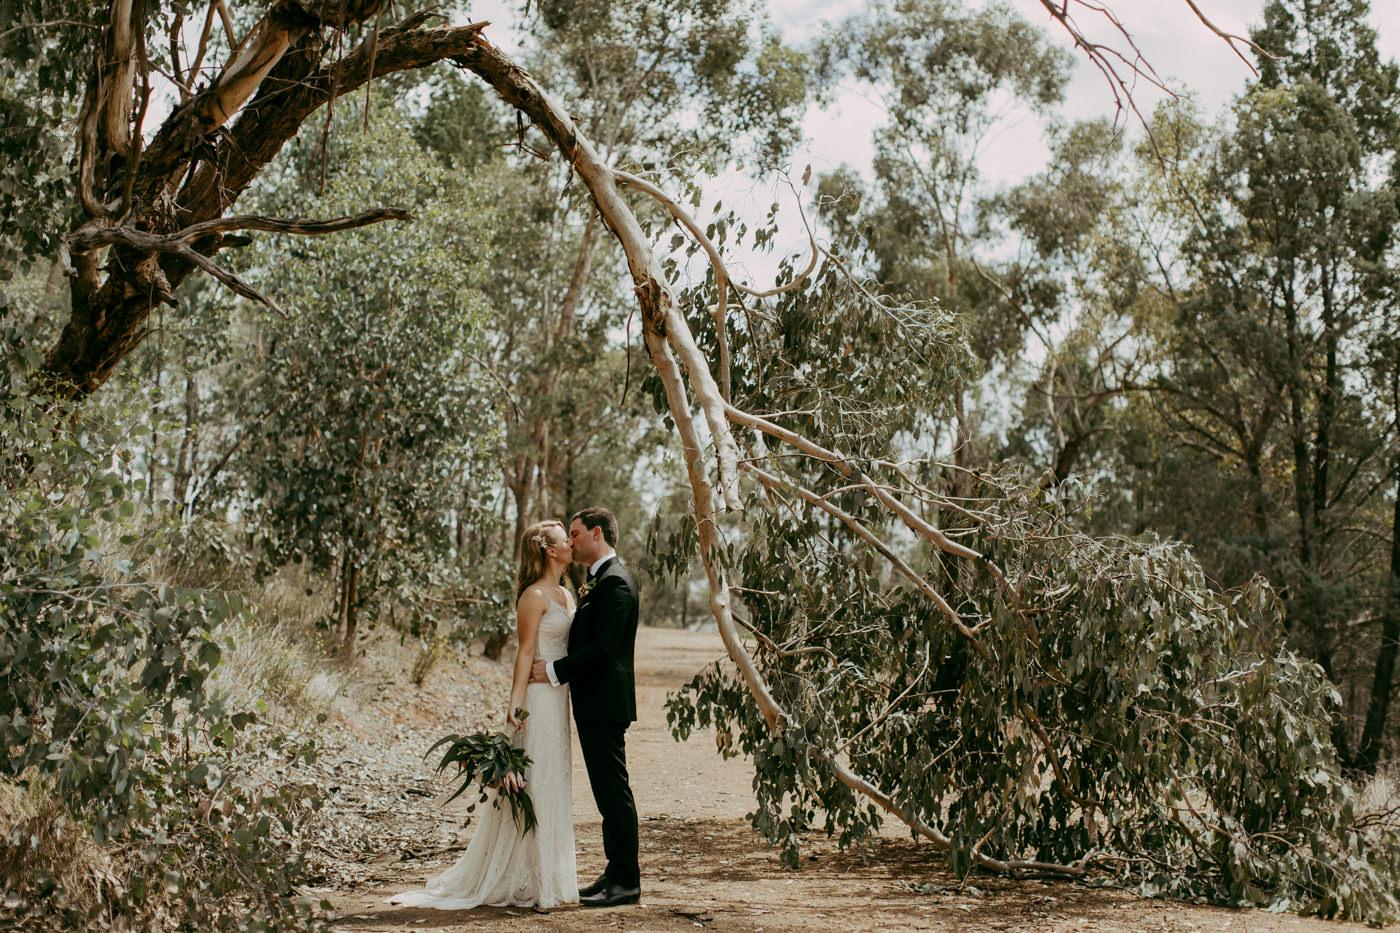 Anthony & Eliet - Wagga Wagga Wedding - Country NSW - Samantha Heather Photography-69.jpg